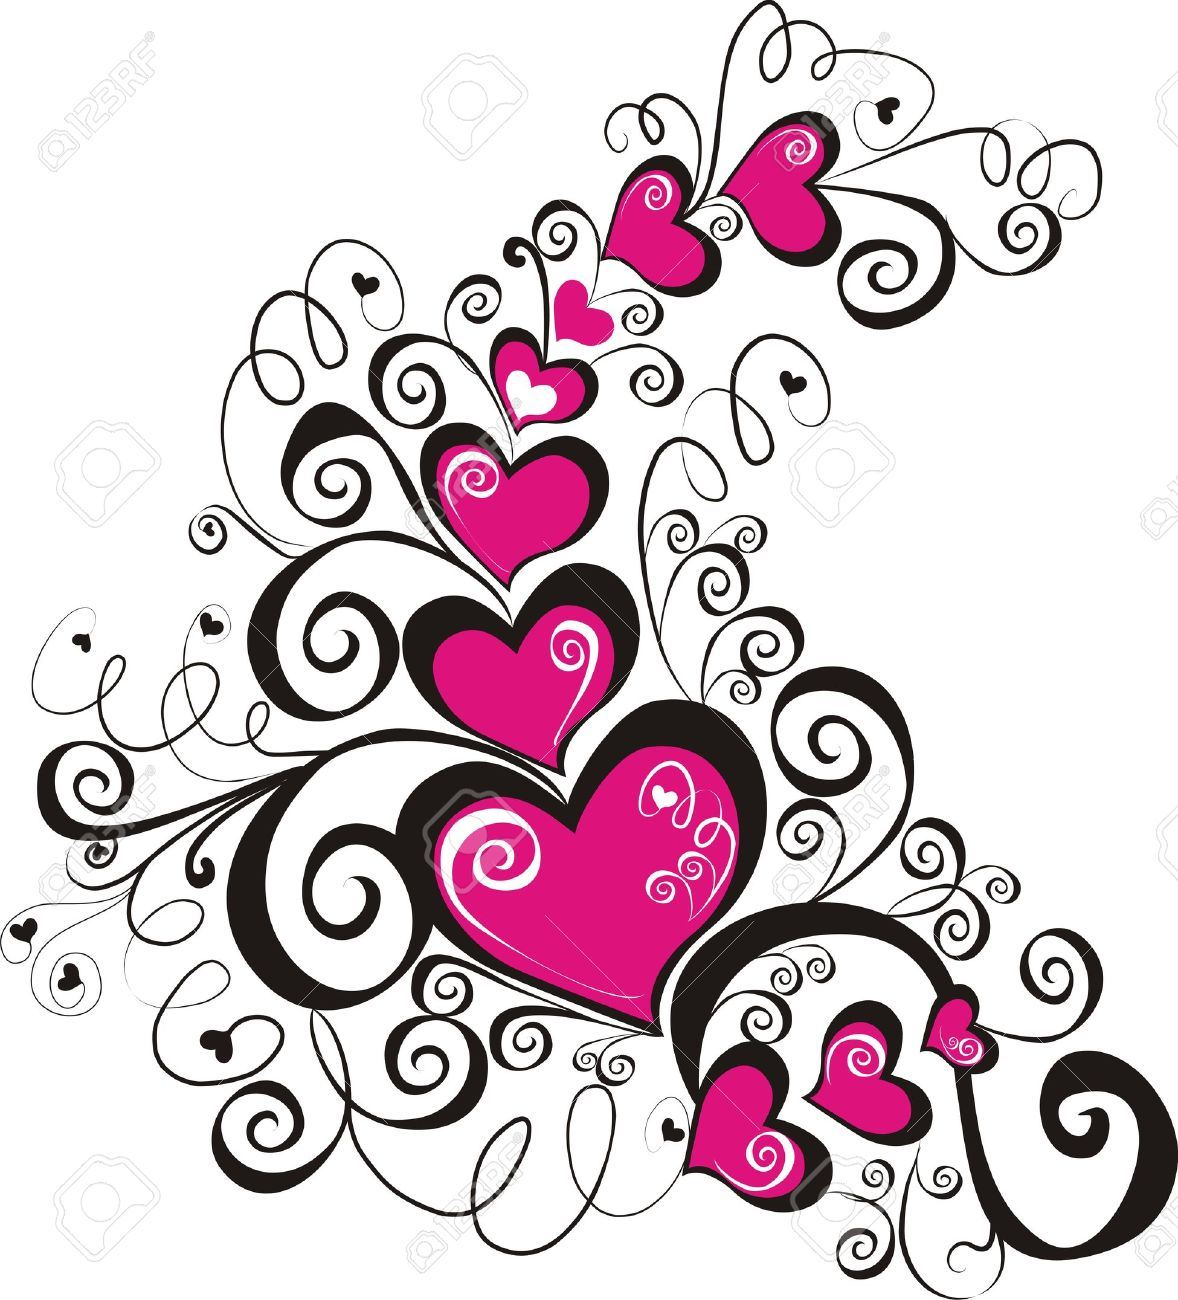 Decorative hearts, element for design.